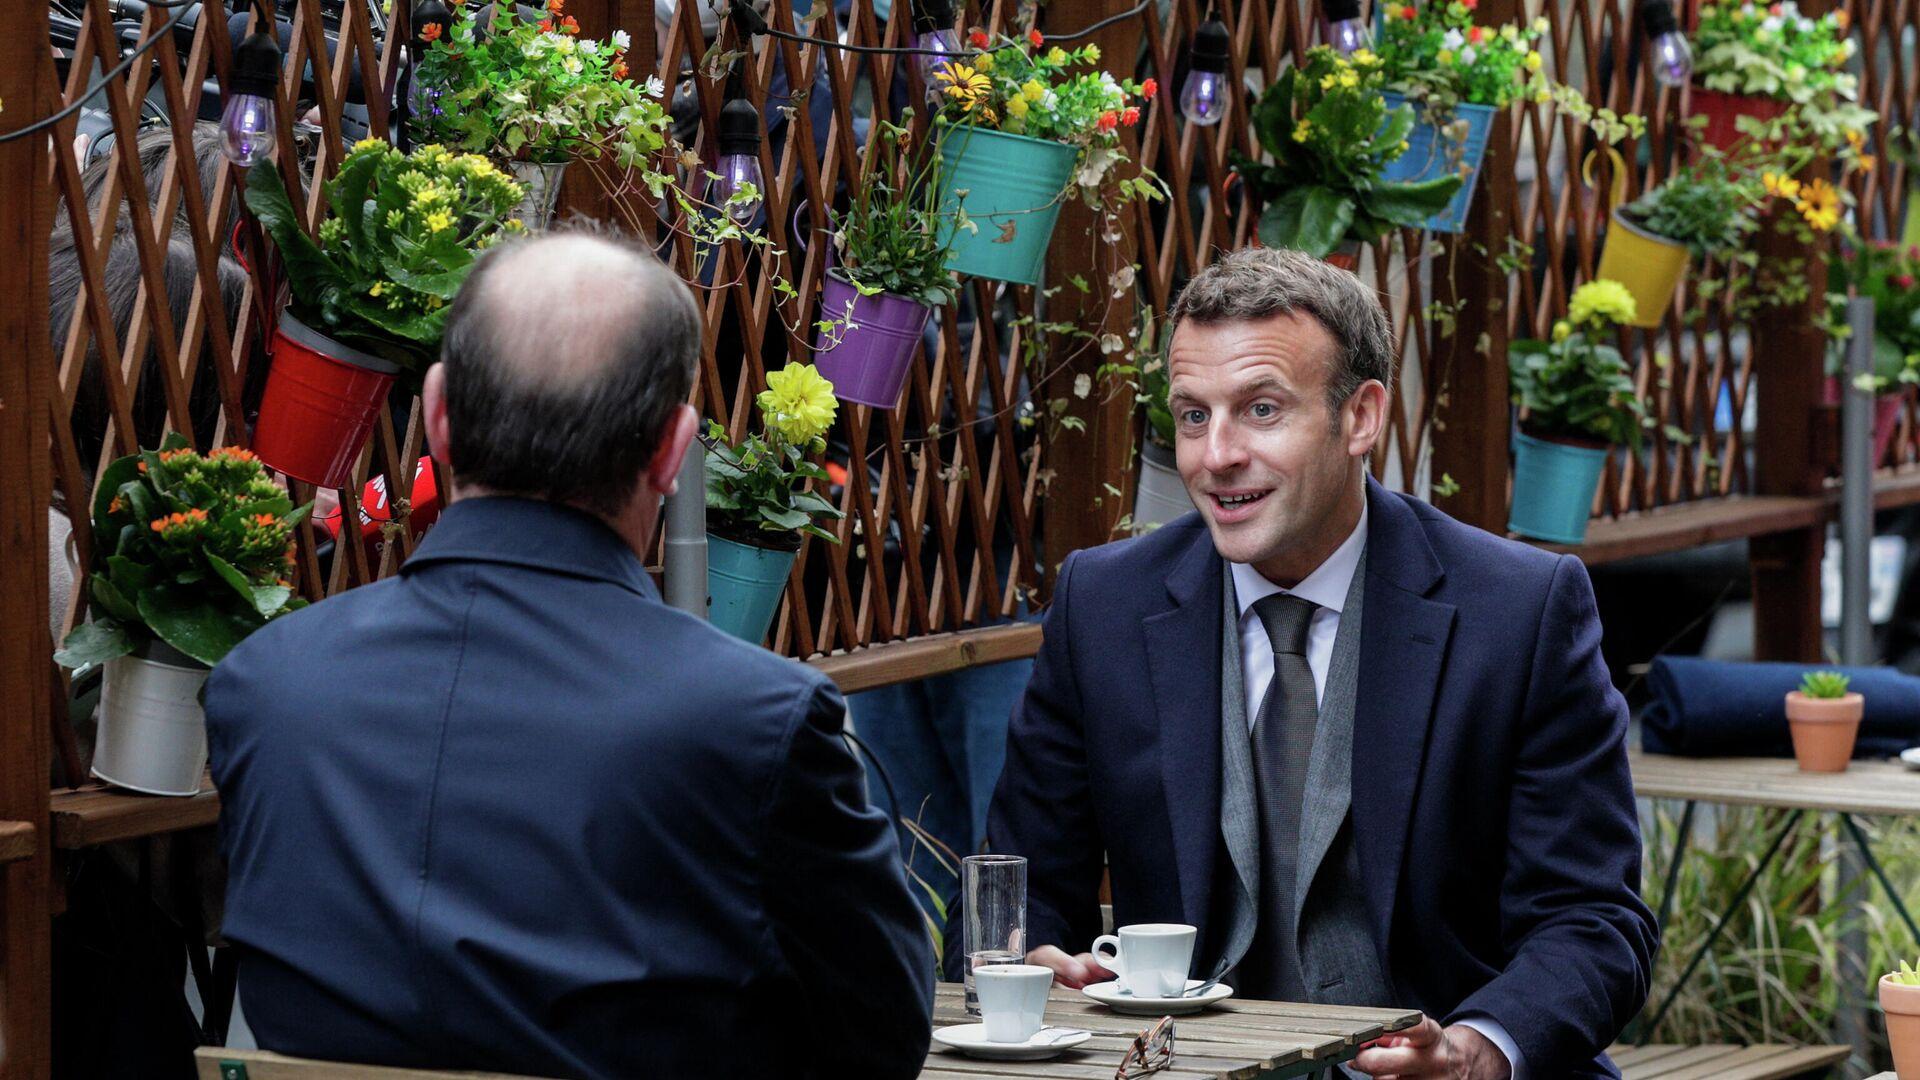 El presidente de Francia, Emmanuel Macron, toma café - Sputnik Mundo, 1920, 19.05.2021